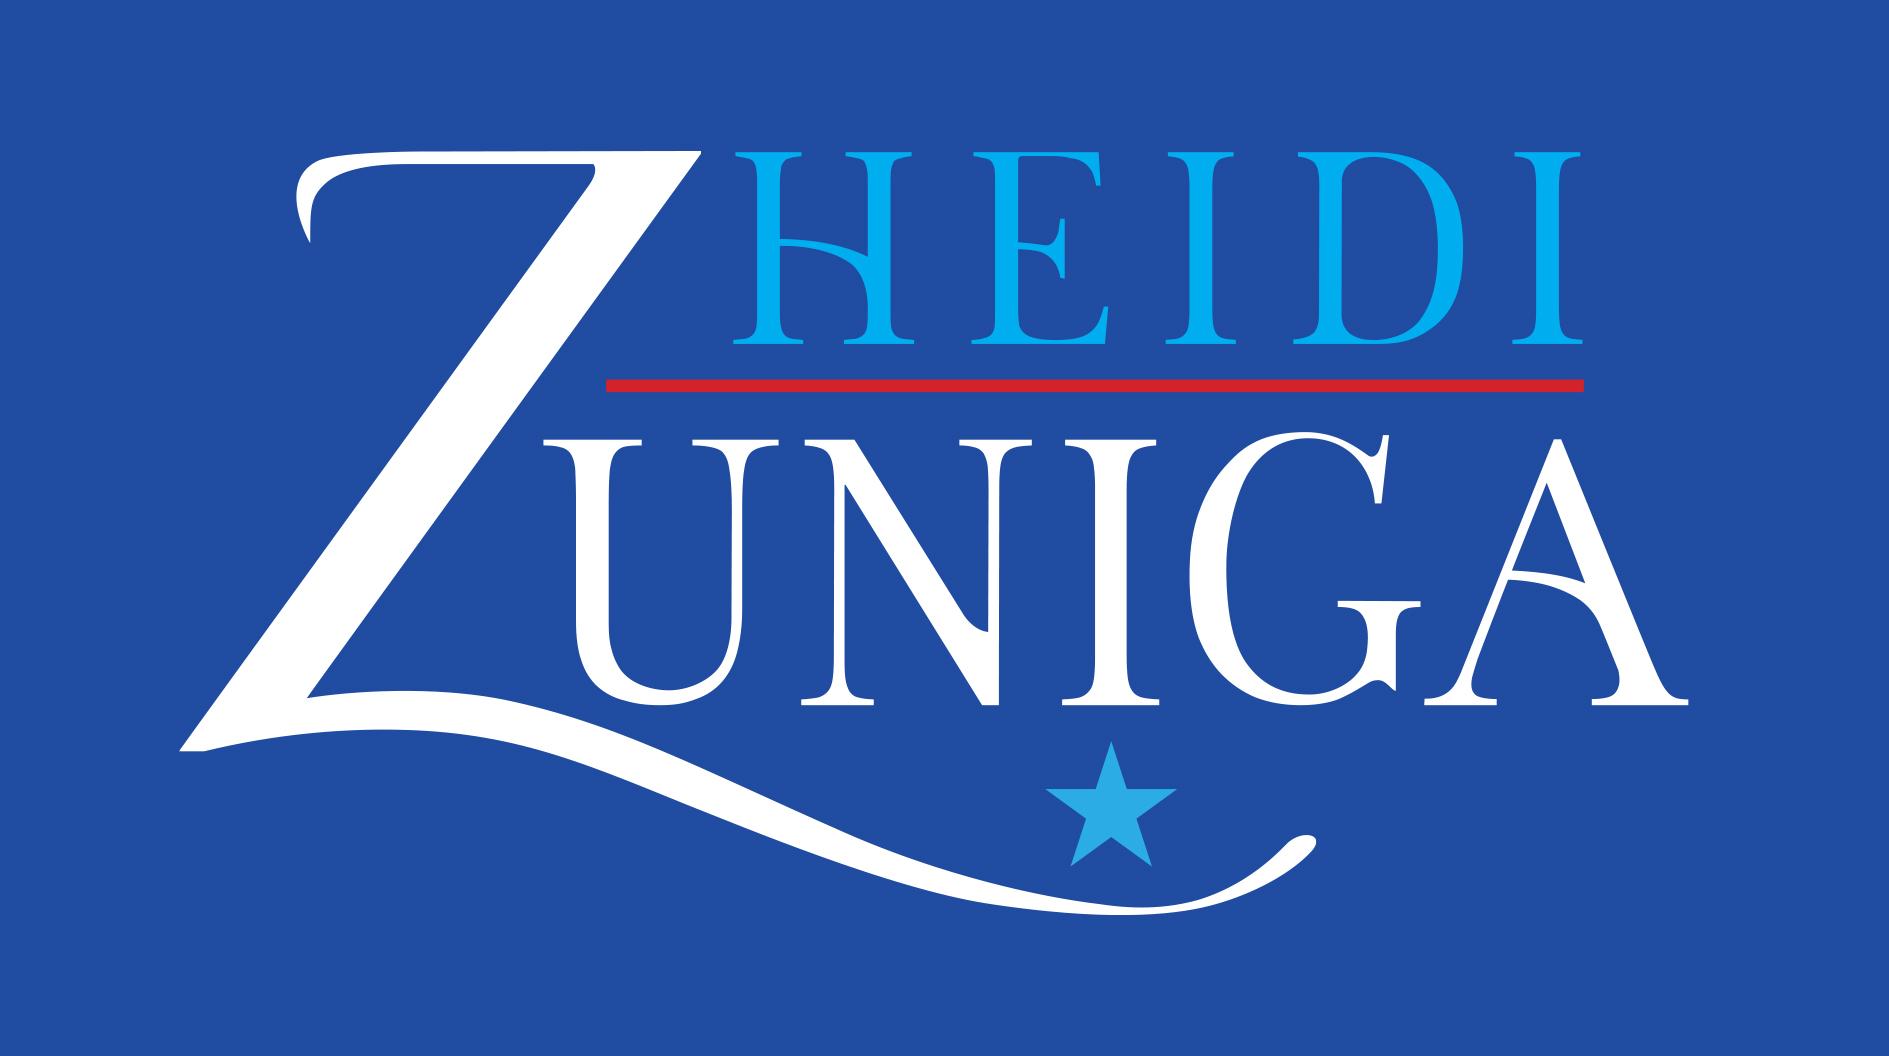 HeidiZunigaLogoOnBlue2.jpg